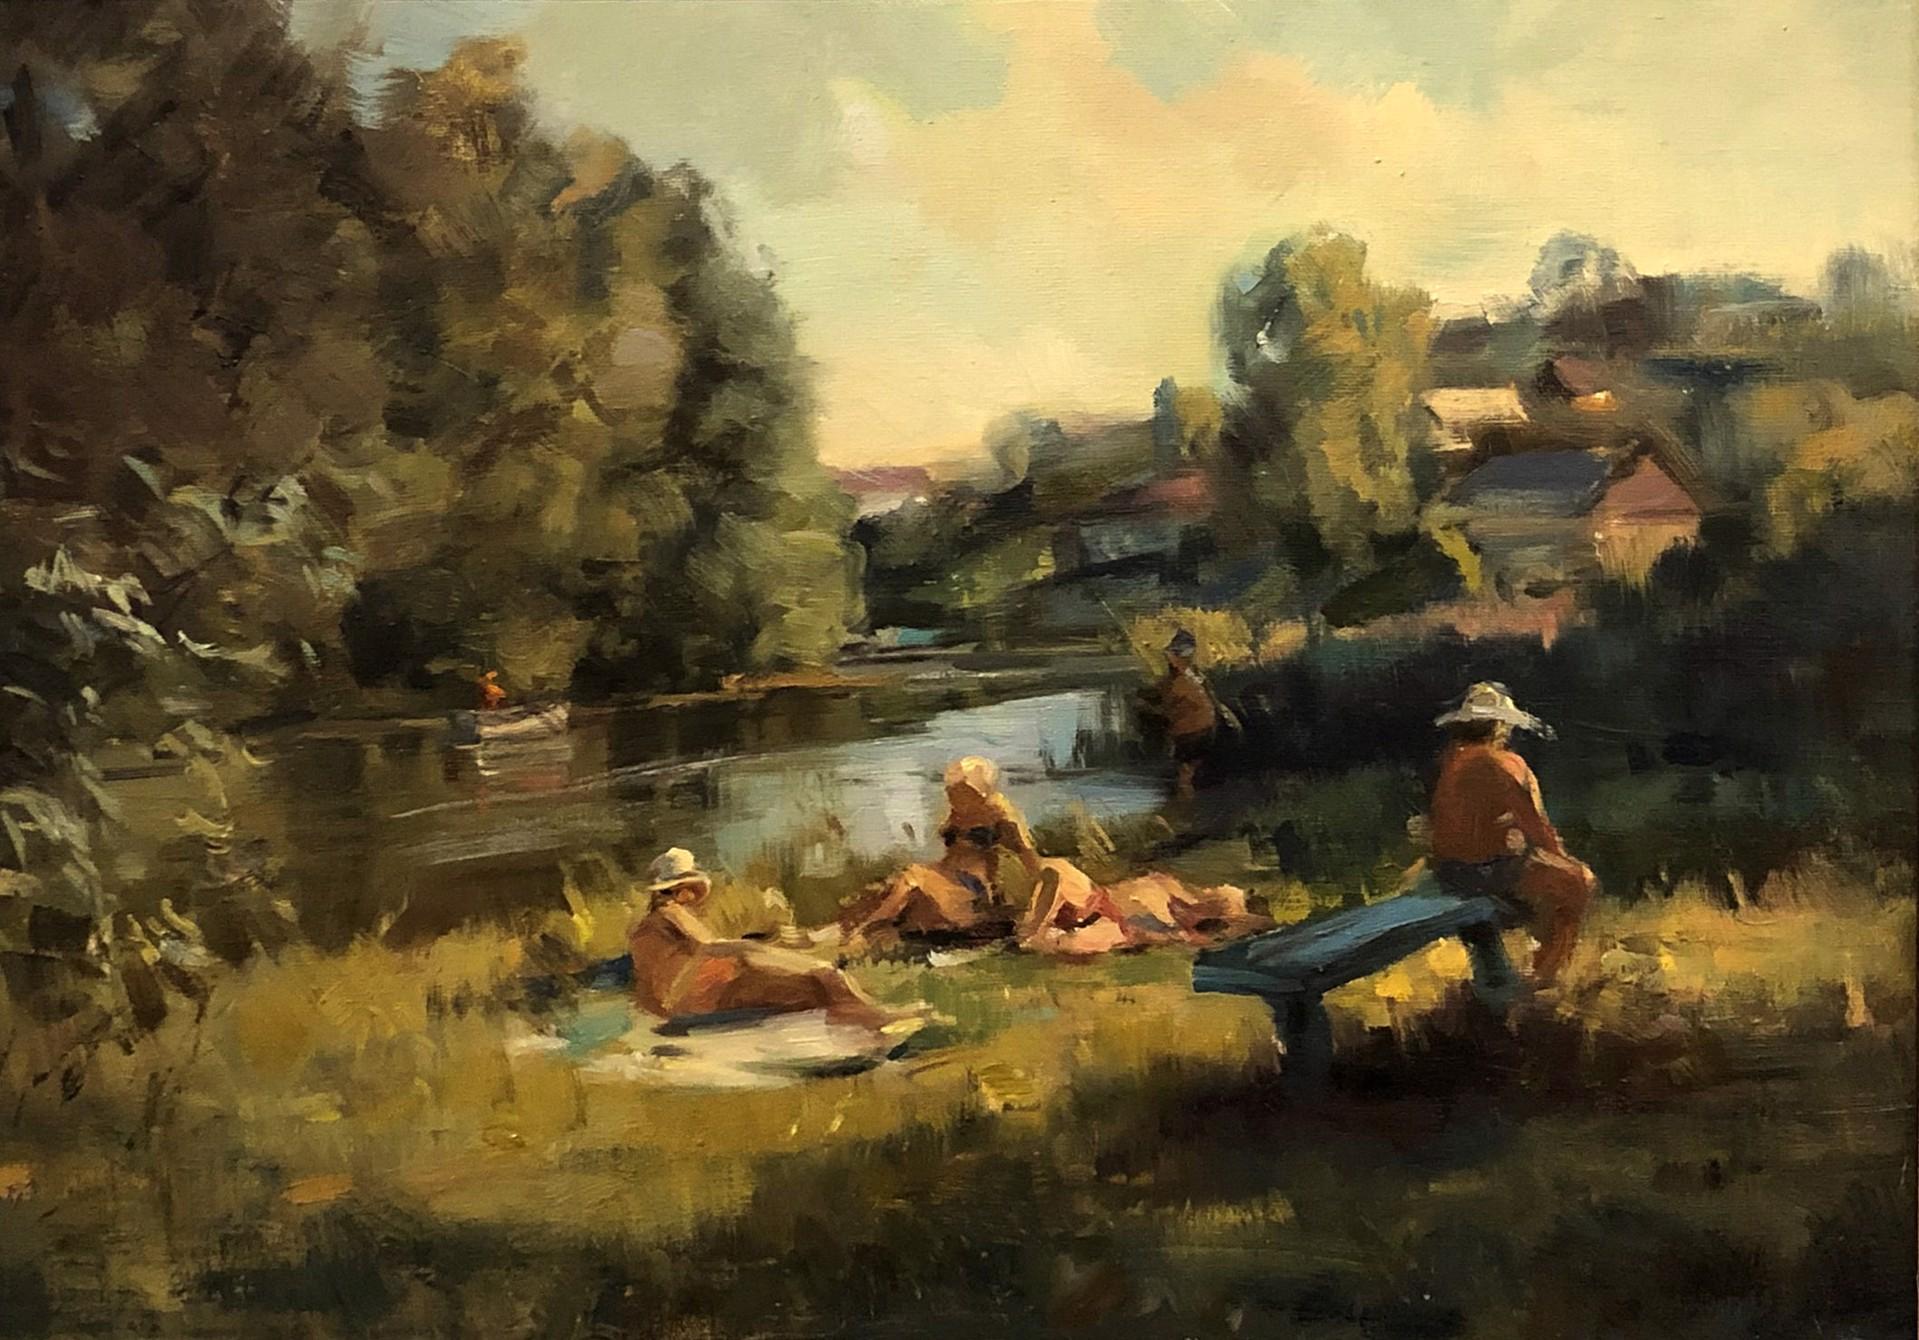 Svetlana S. Lisitsina - On the River by Russian Artists